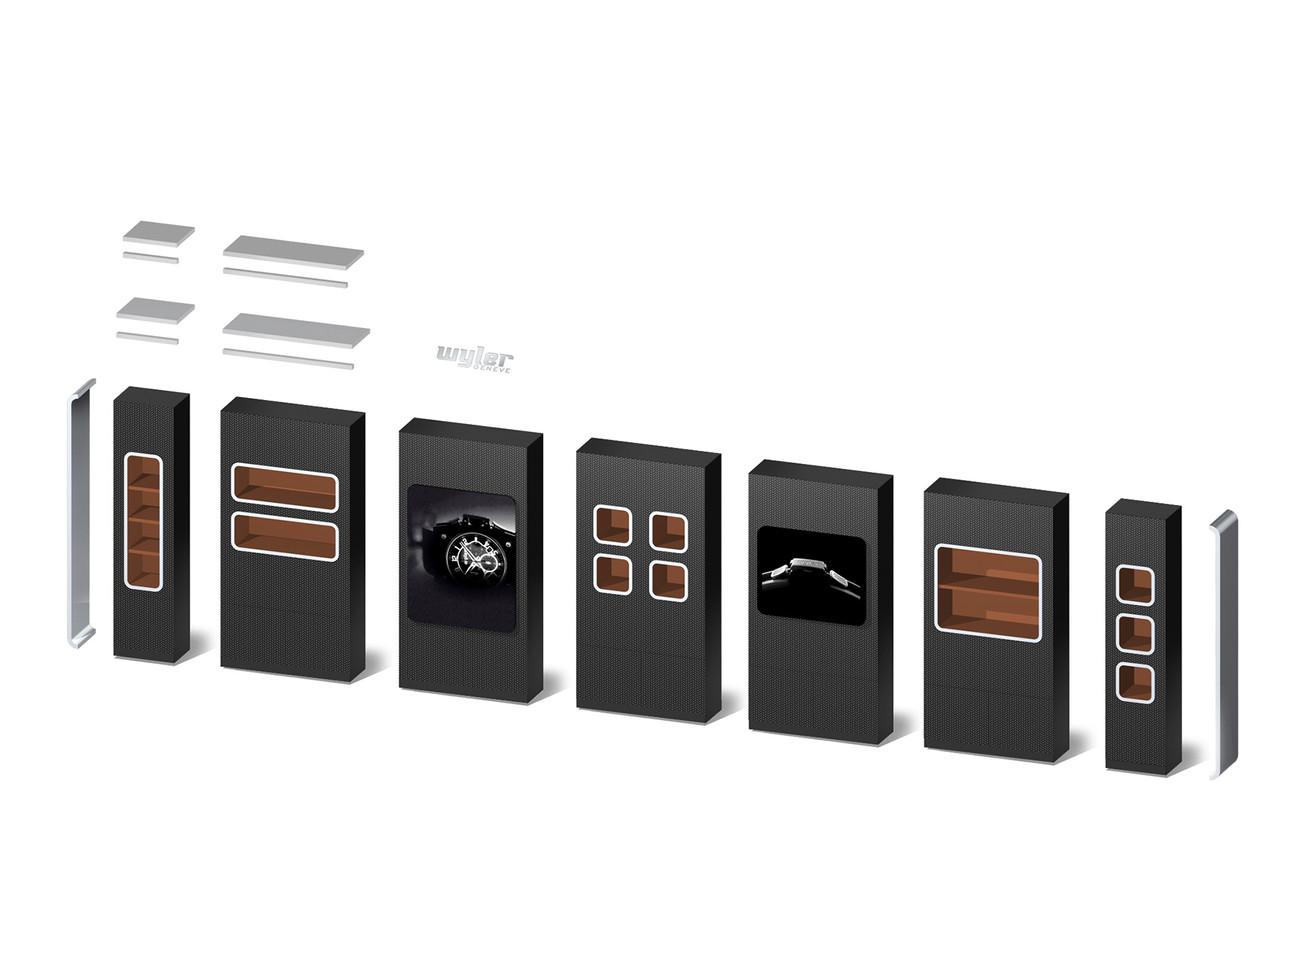 Corner Concept -  Elements